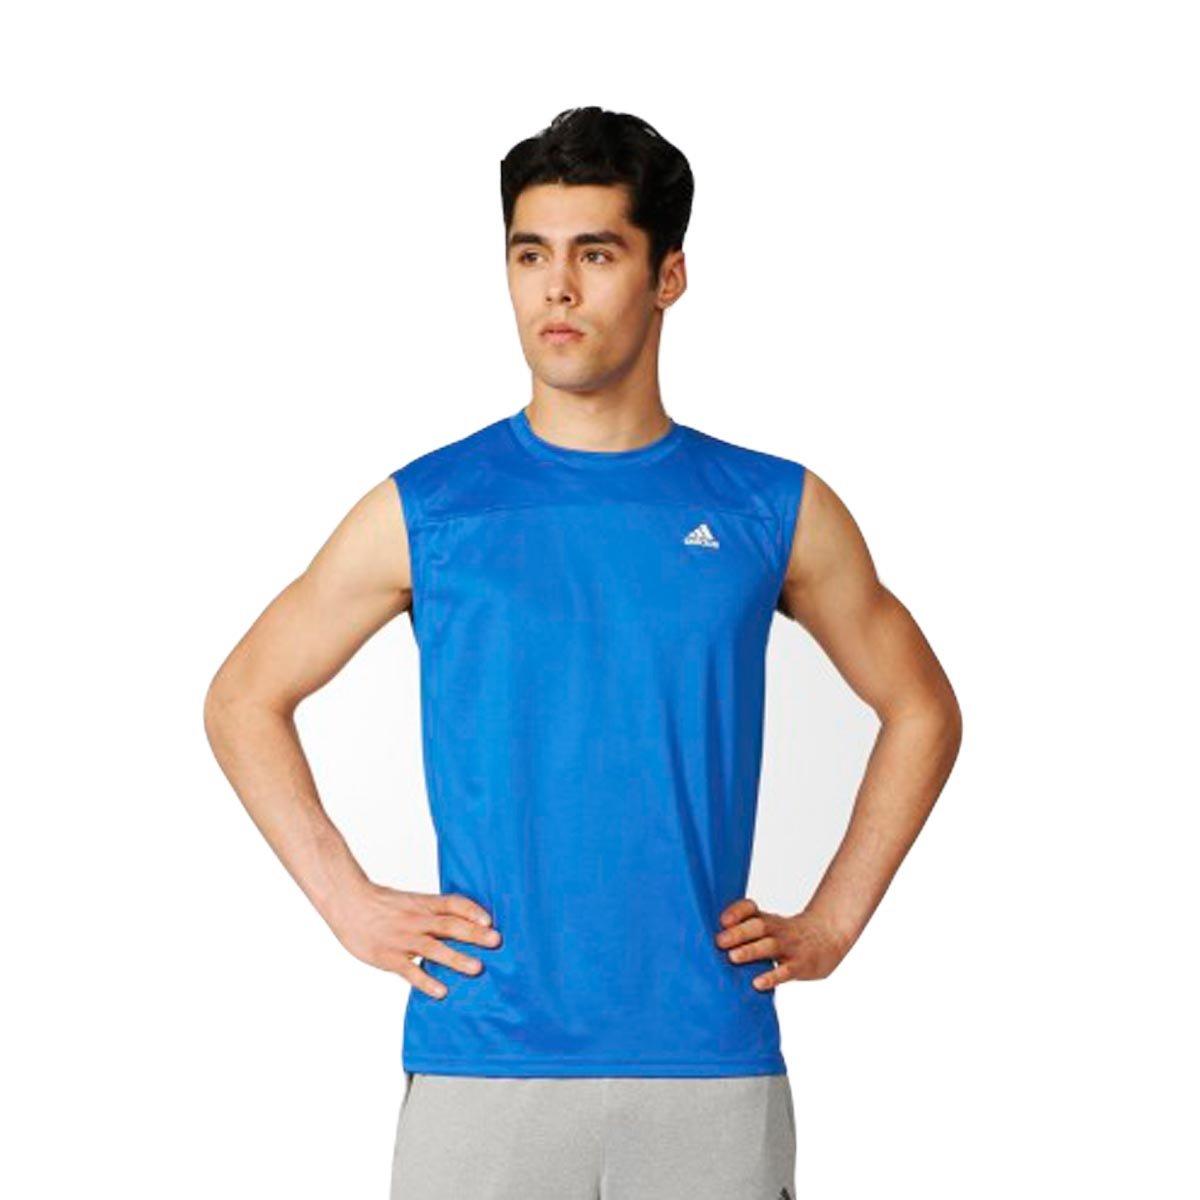 Bizz Store - Regata Masculina Adidas Base Plain Azul Treino e473c546925